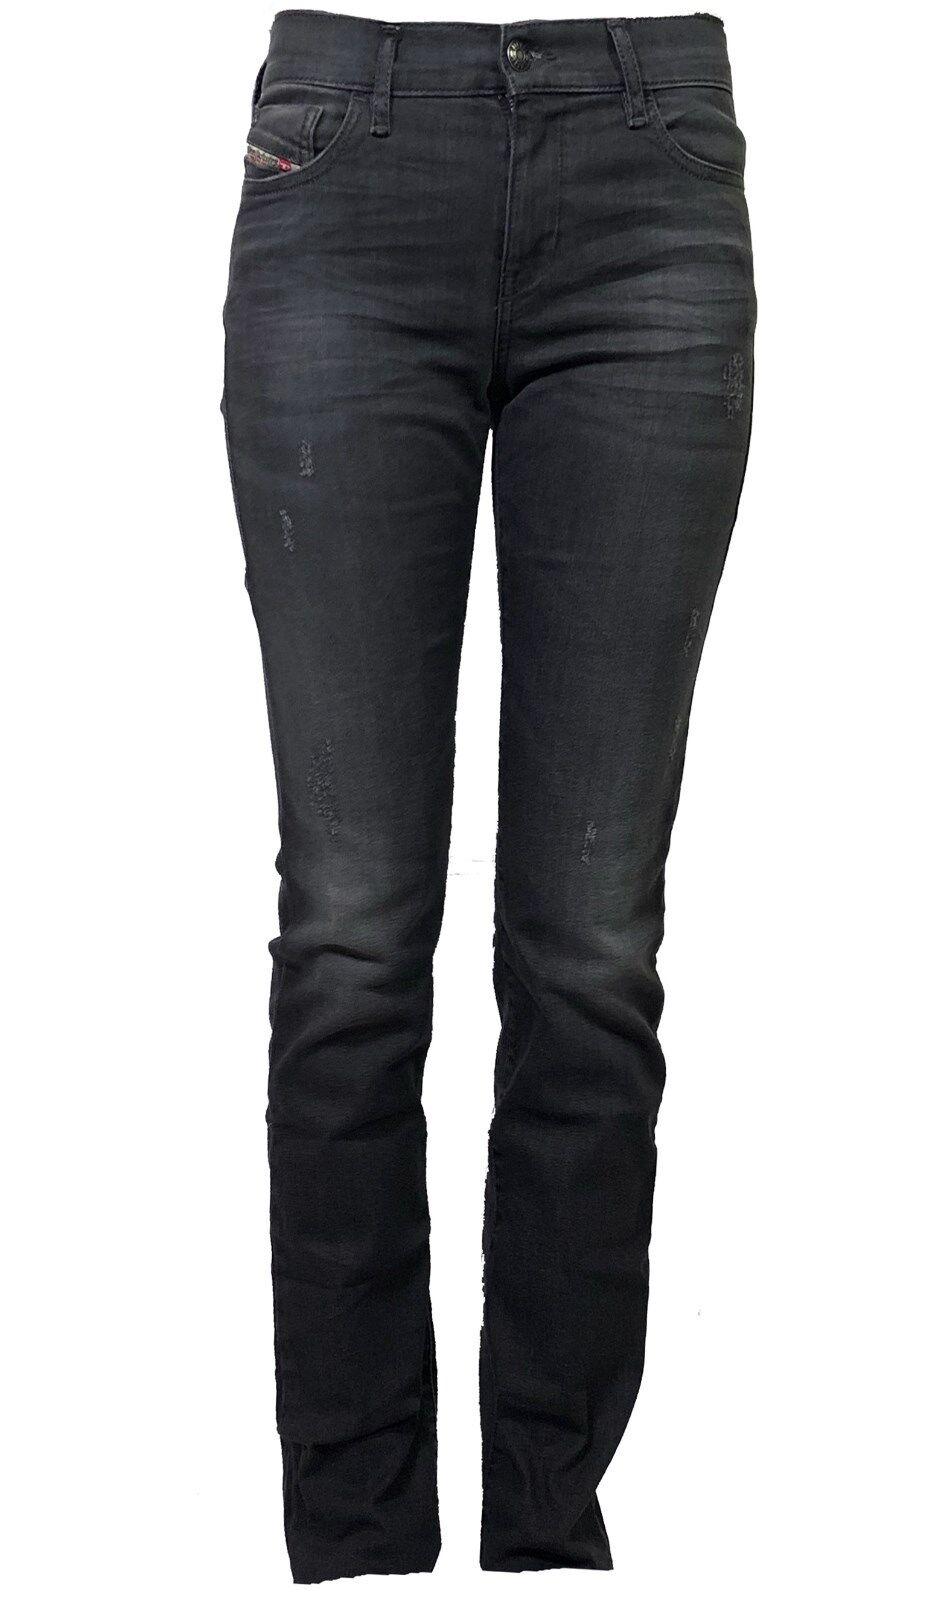 Diesel Damen Stretch Jeans STRAITZEE 0815B slim  grau  used look  dezent  NEU